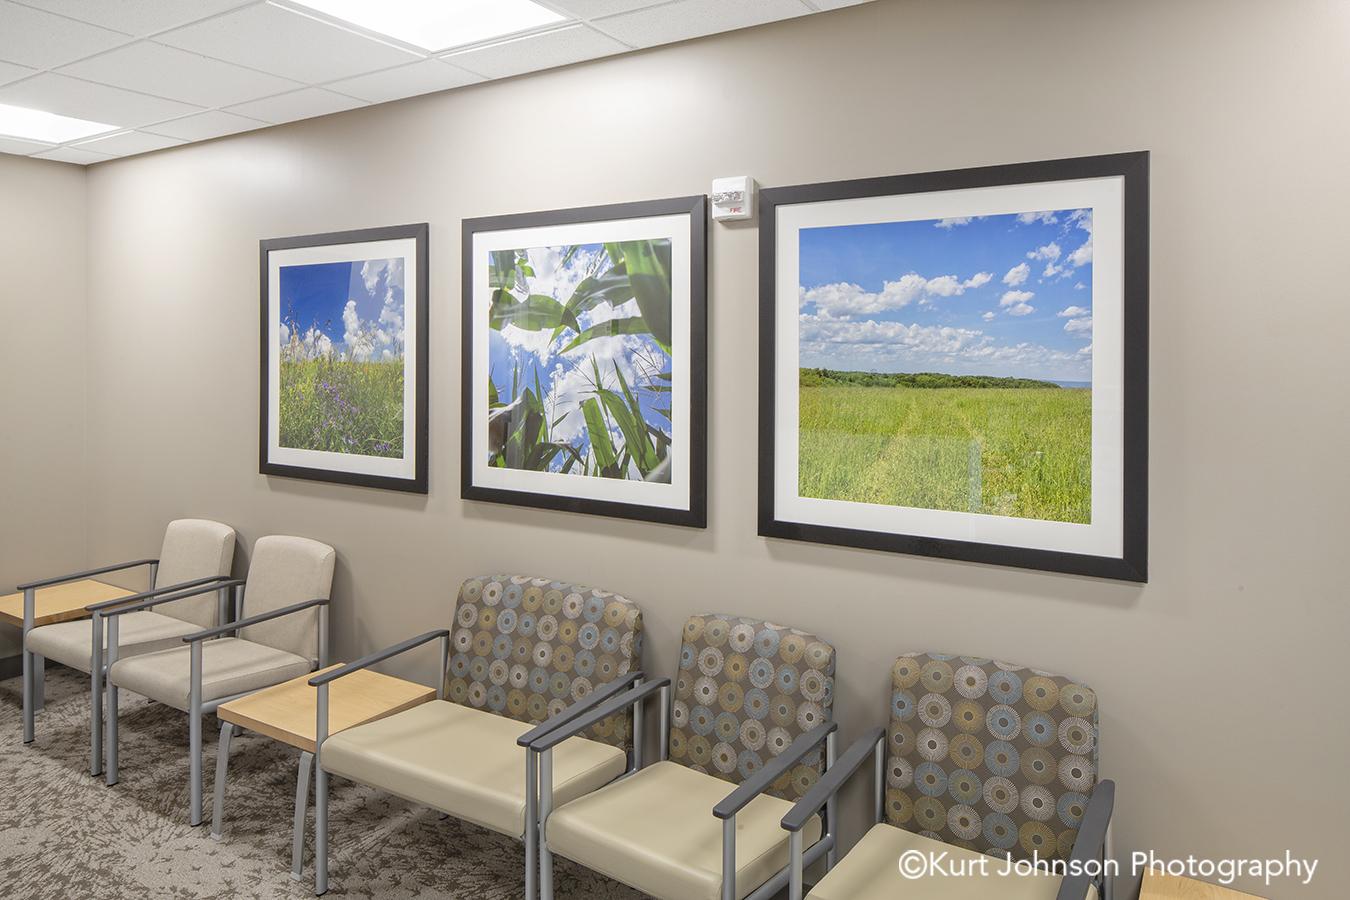 wood framed landscape nature art install waiting seating area faith regional health services norfolk nebraska installation